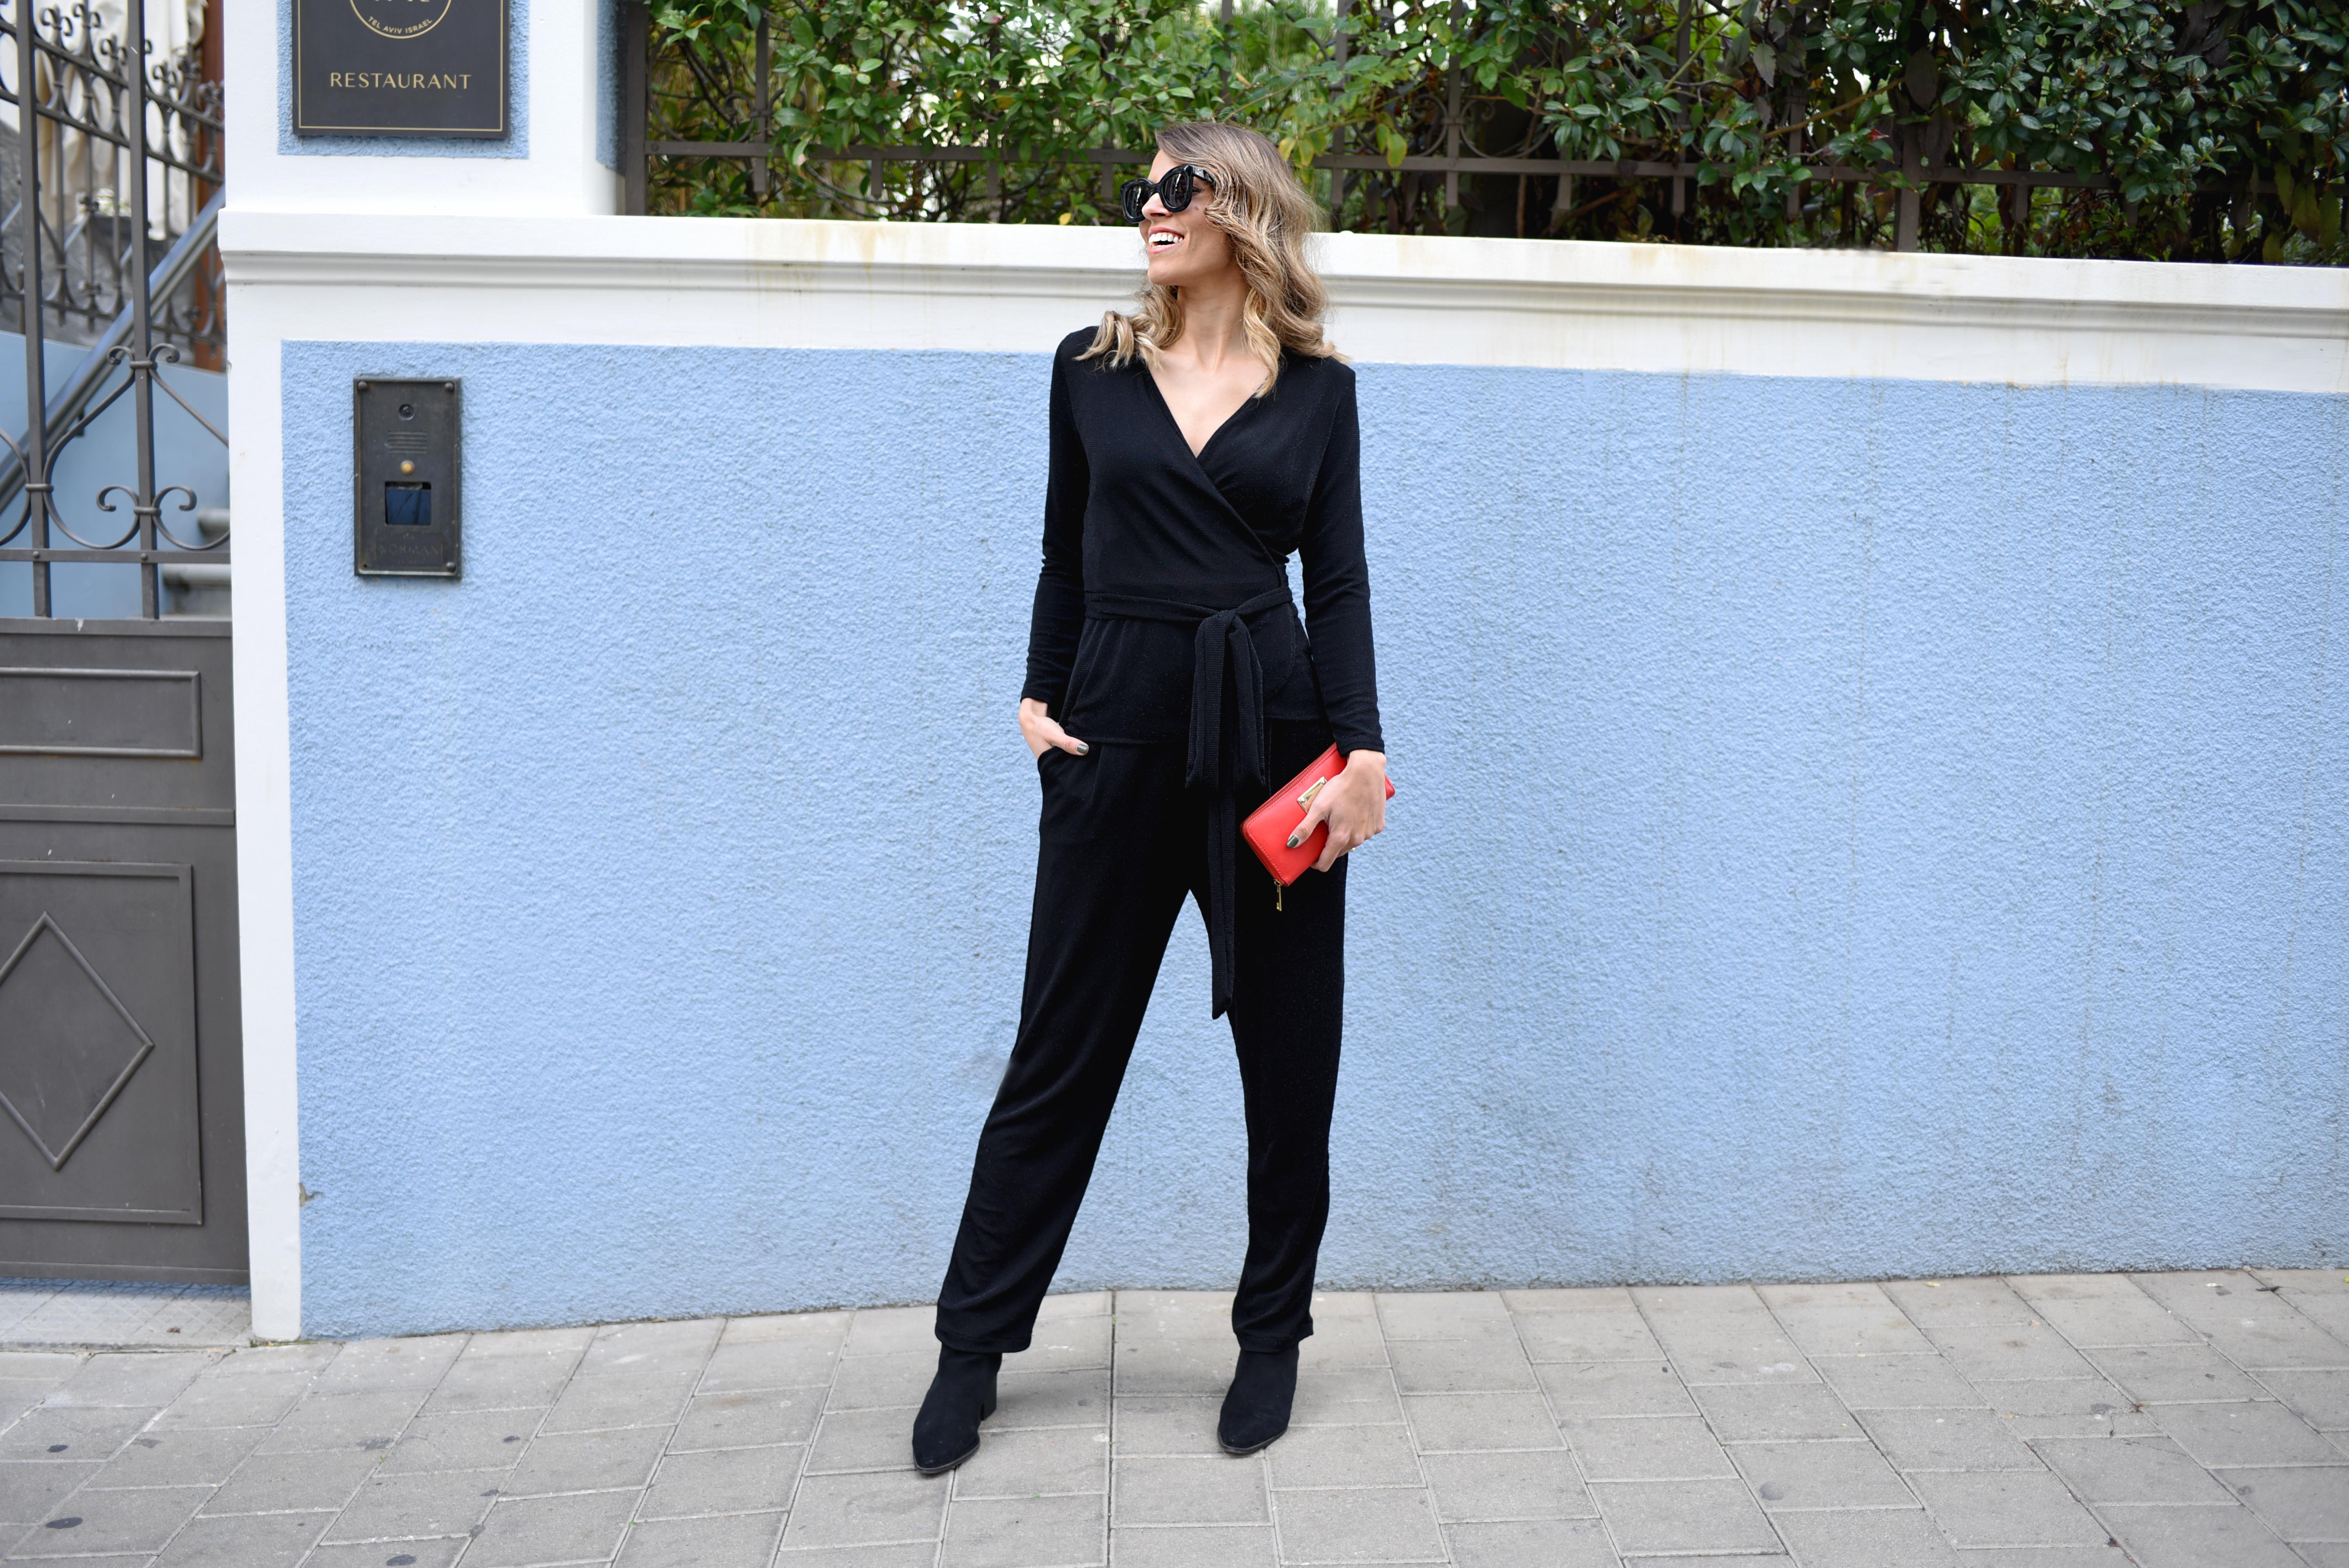 fashion_photography_bekybrock6